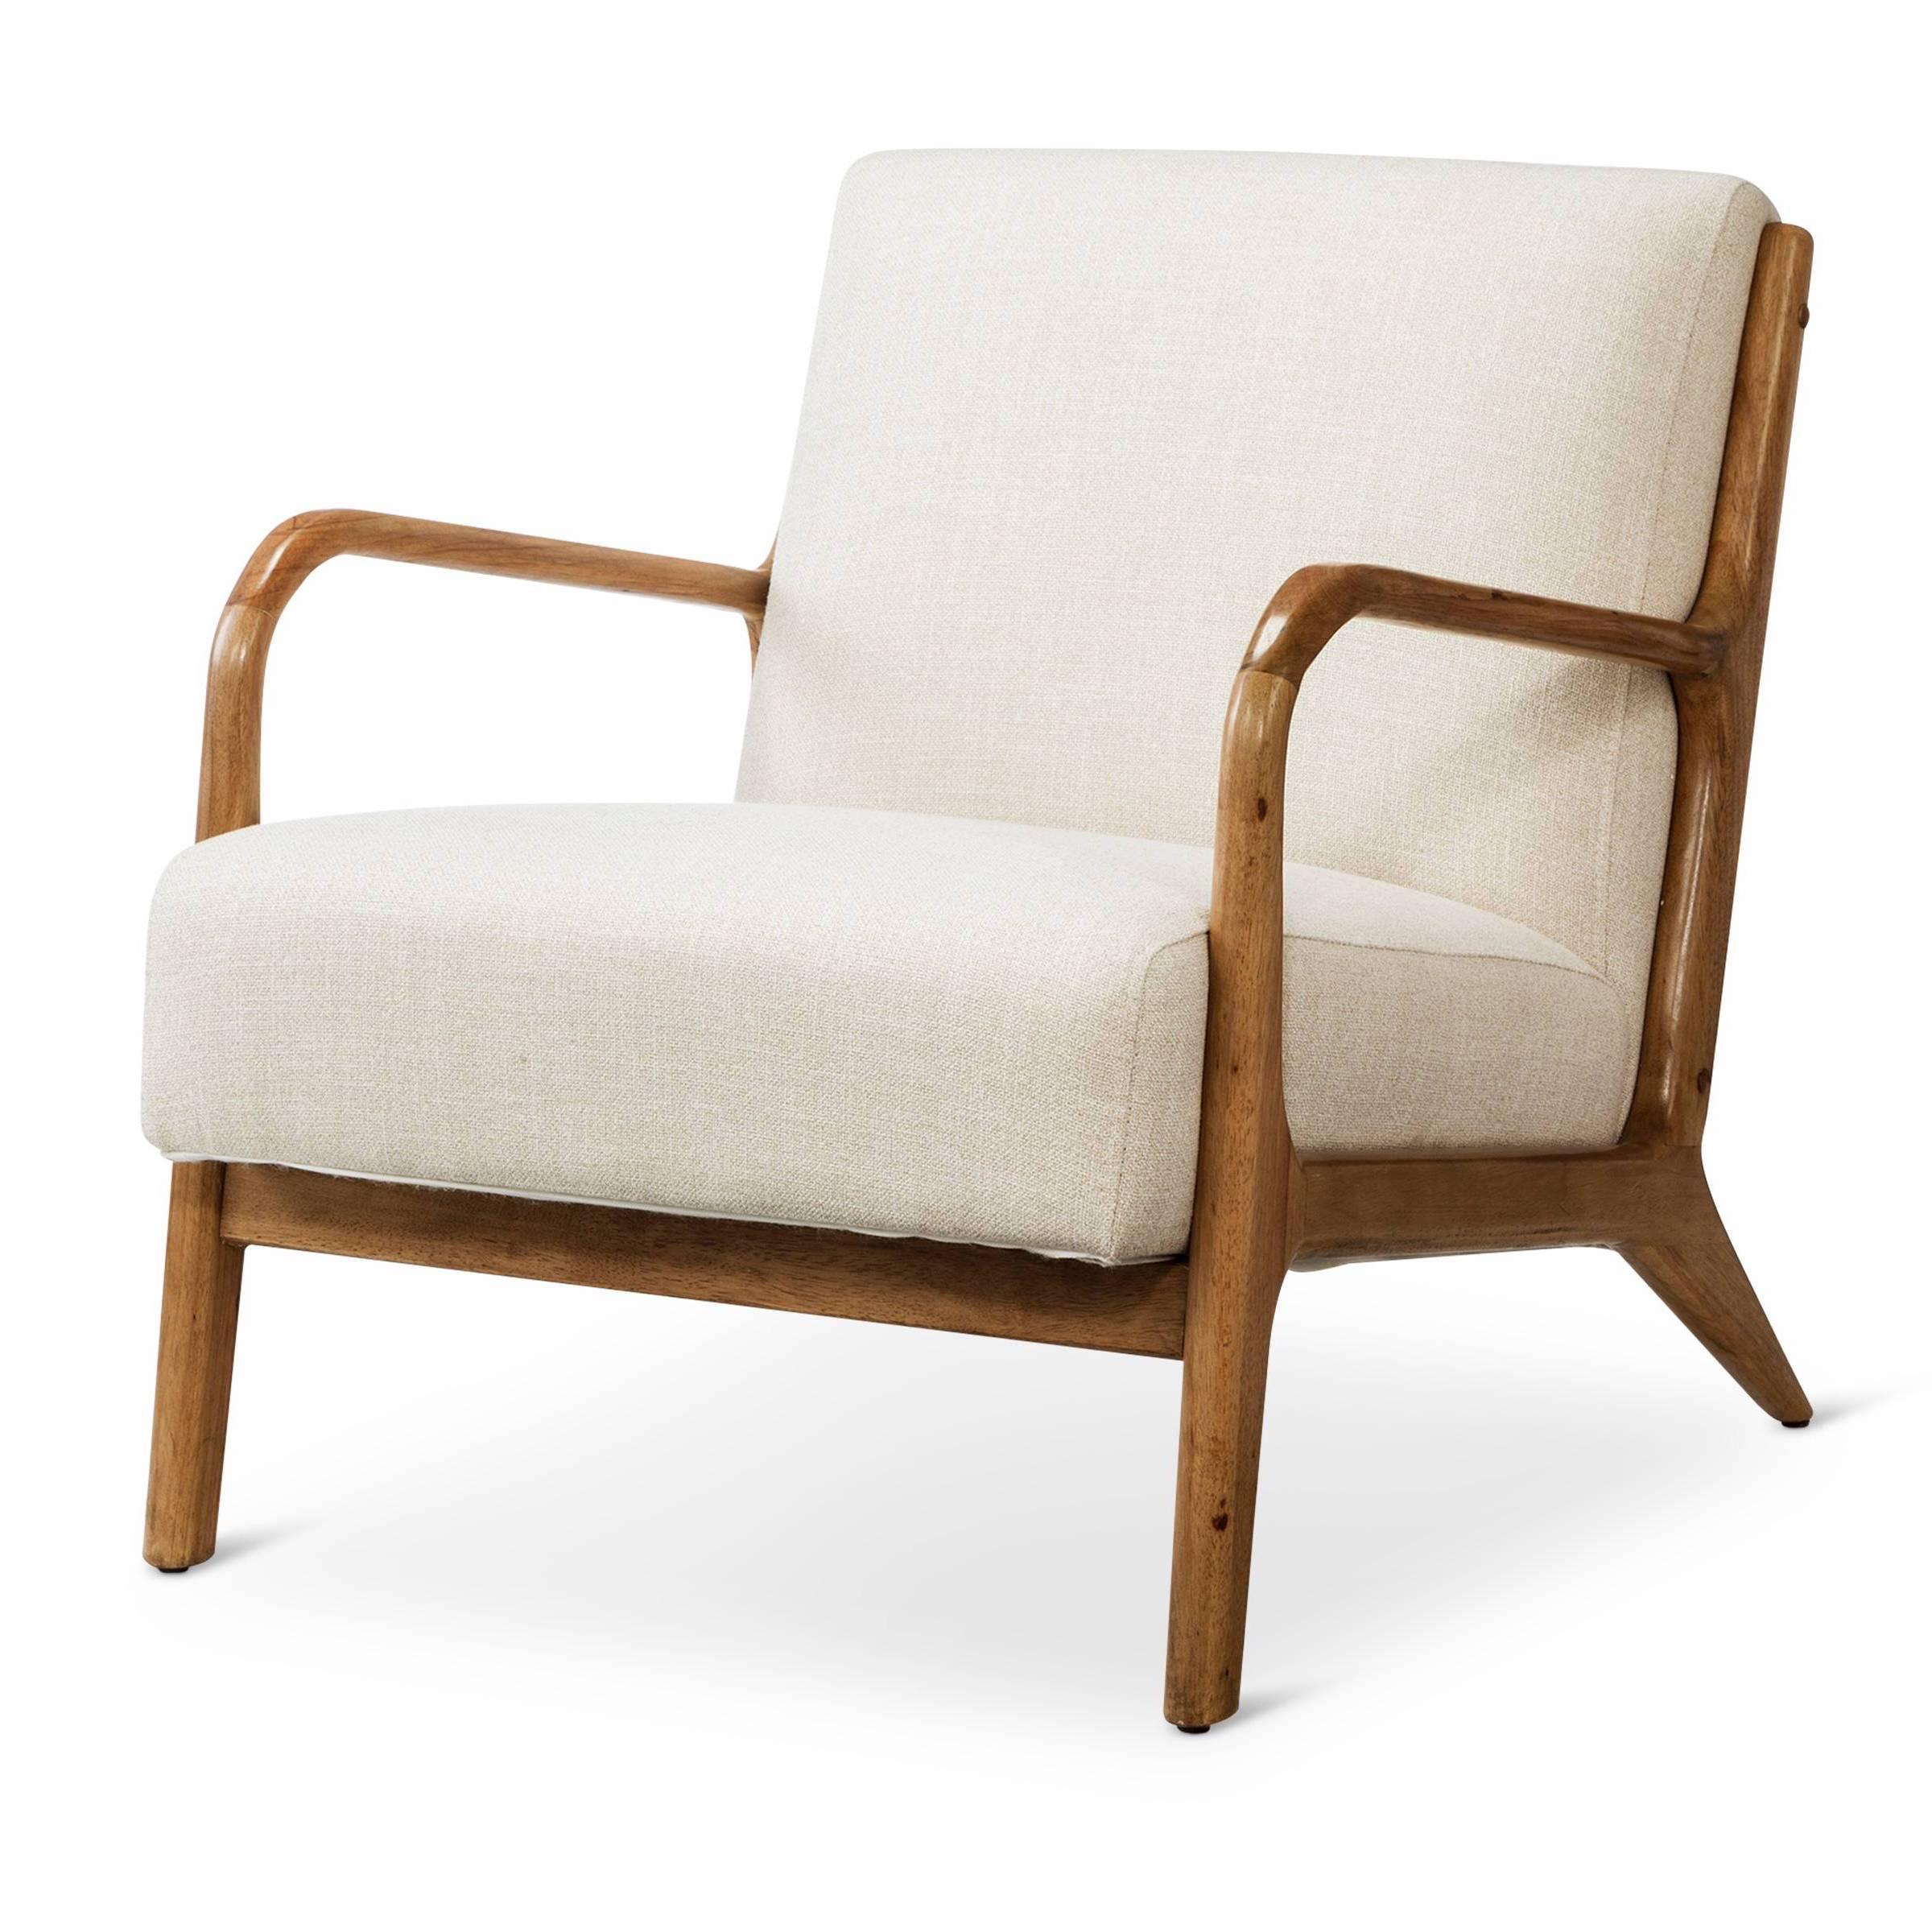 Target Rodney wood arm chair threshold.jpeg